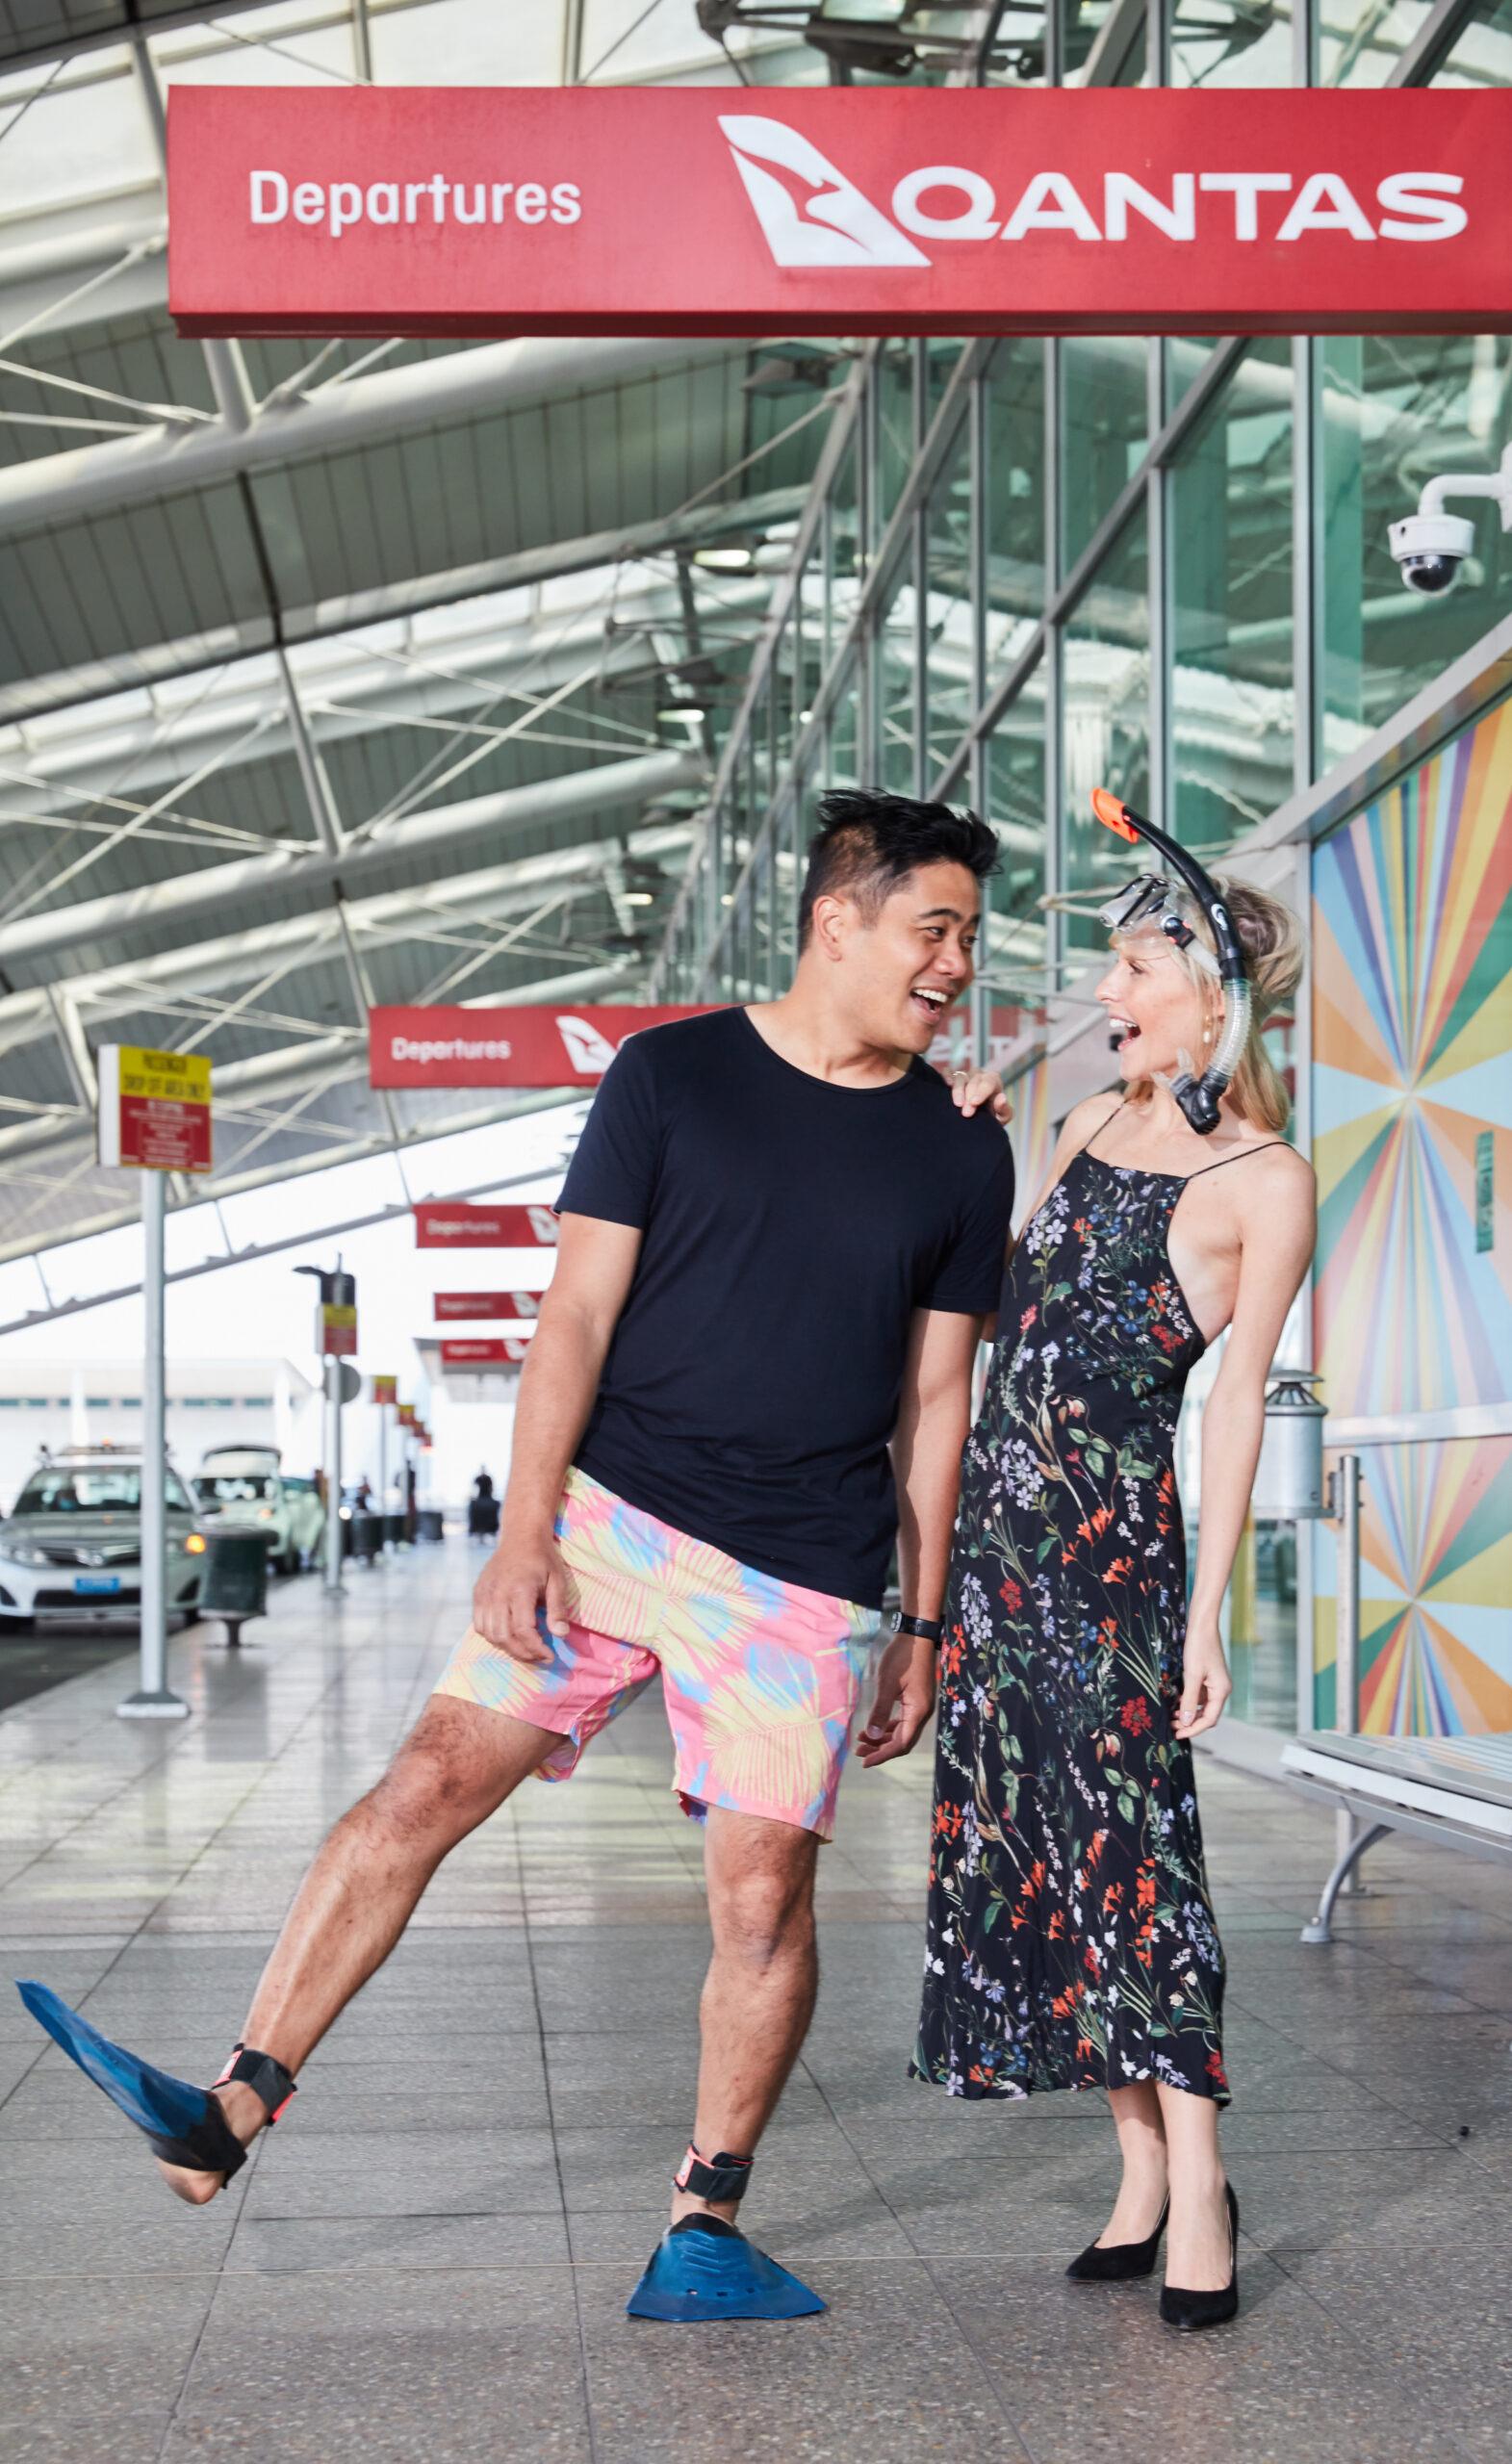 Qantas mystery flights